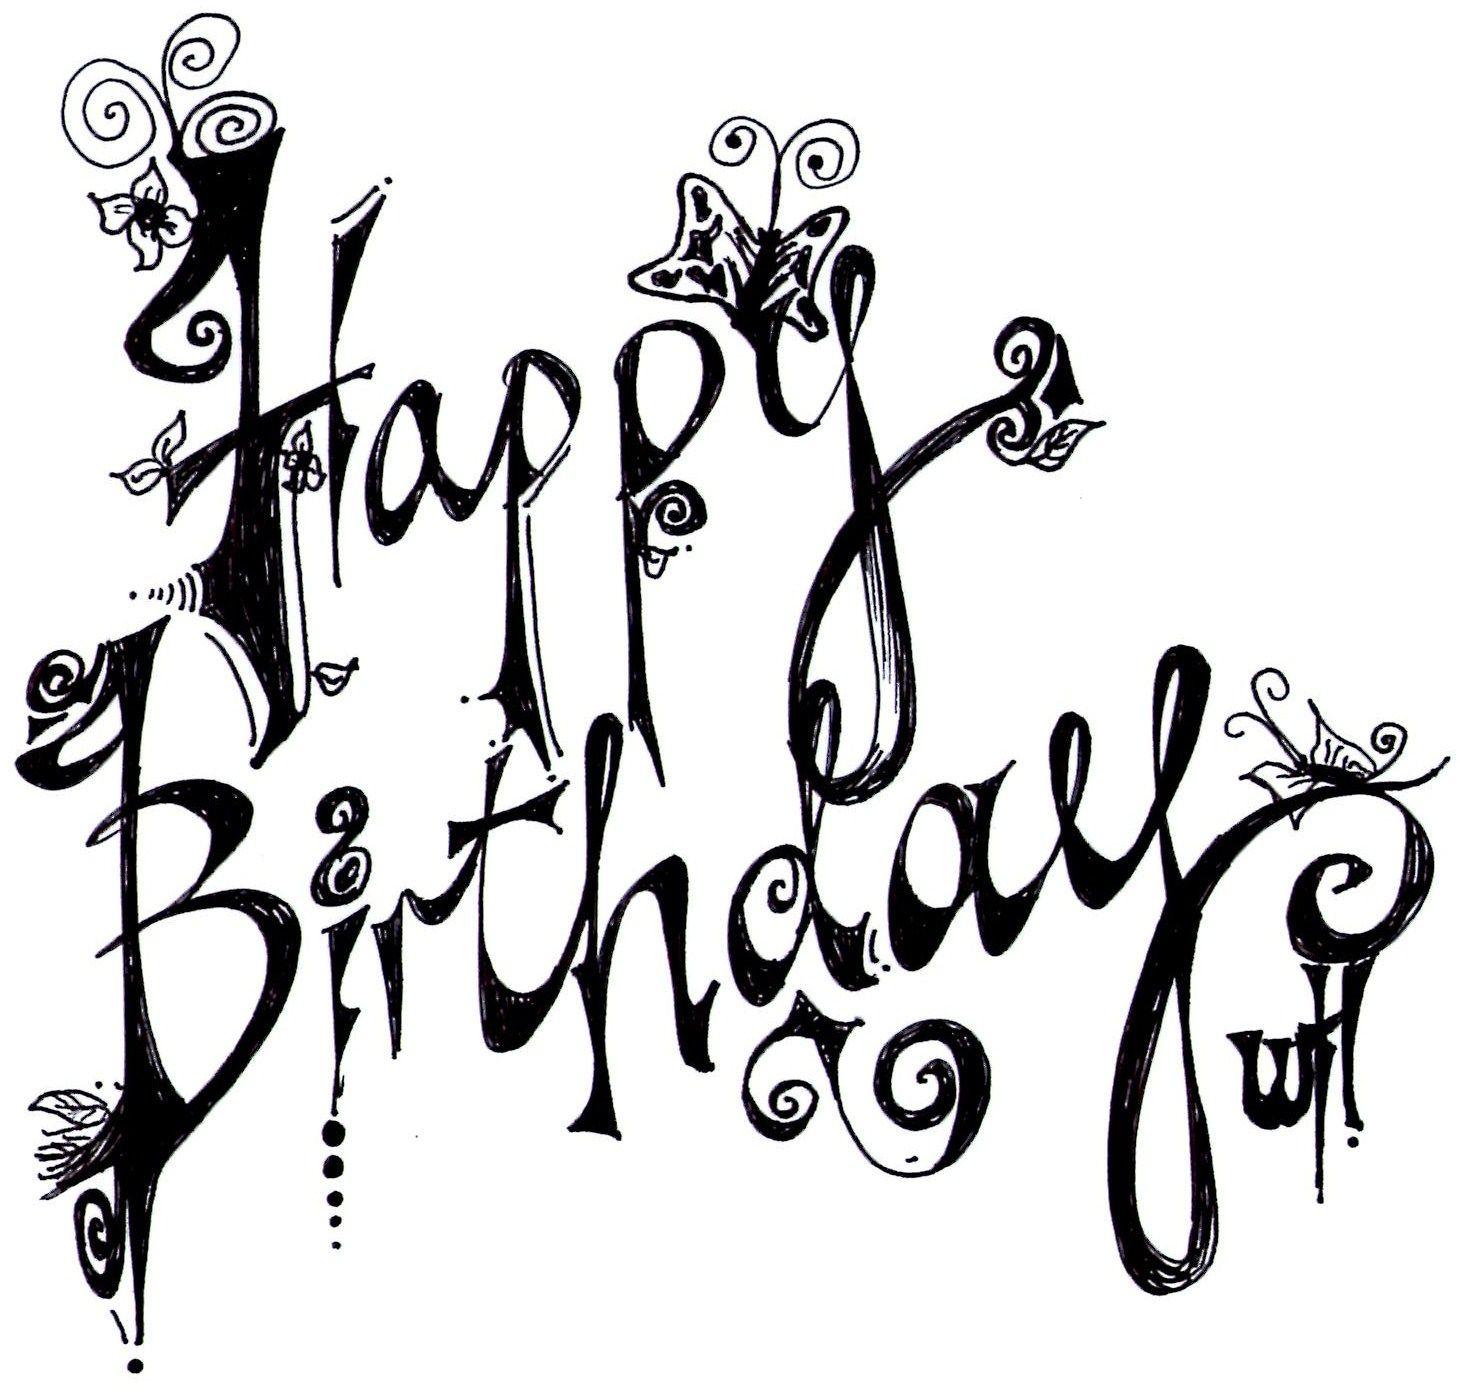 Happy birthday word original artwork pinterest happy